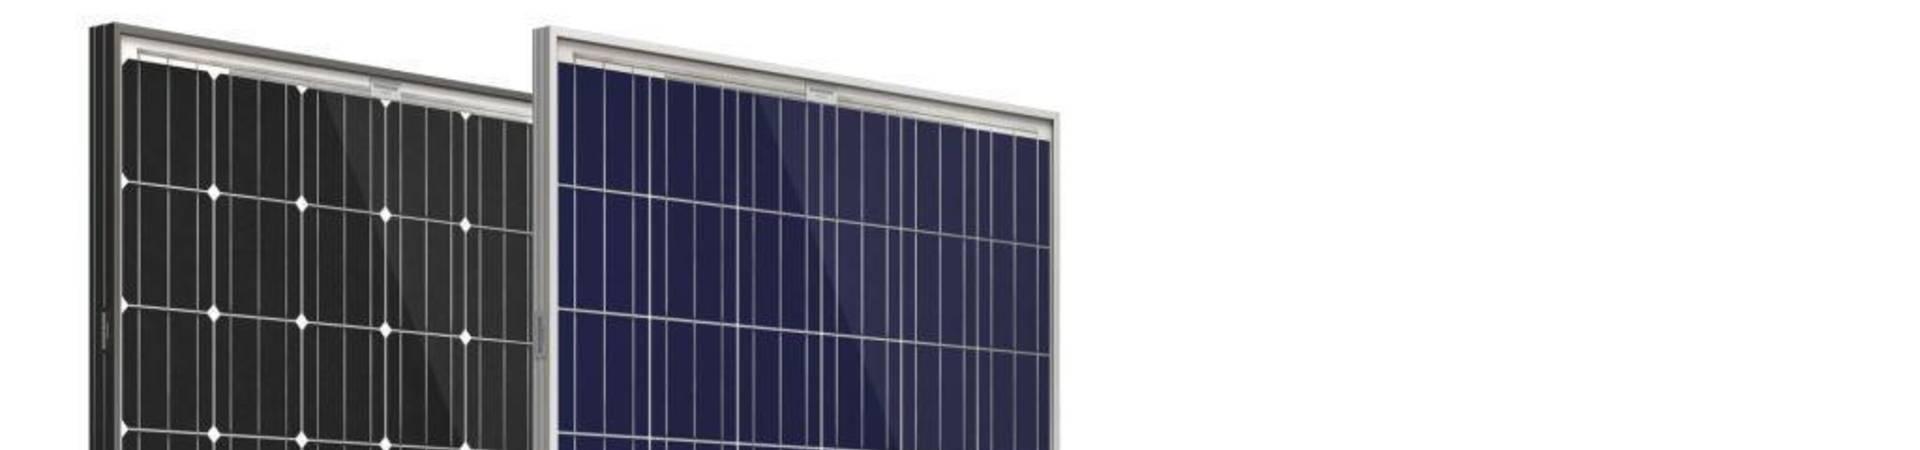 photovoltaikmodule